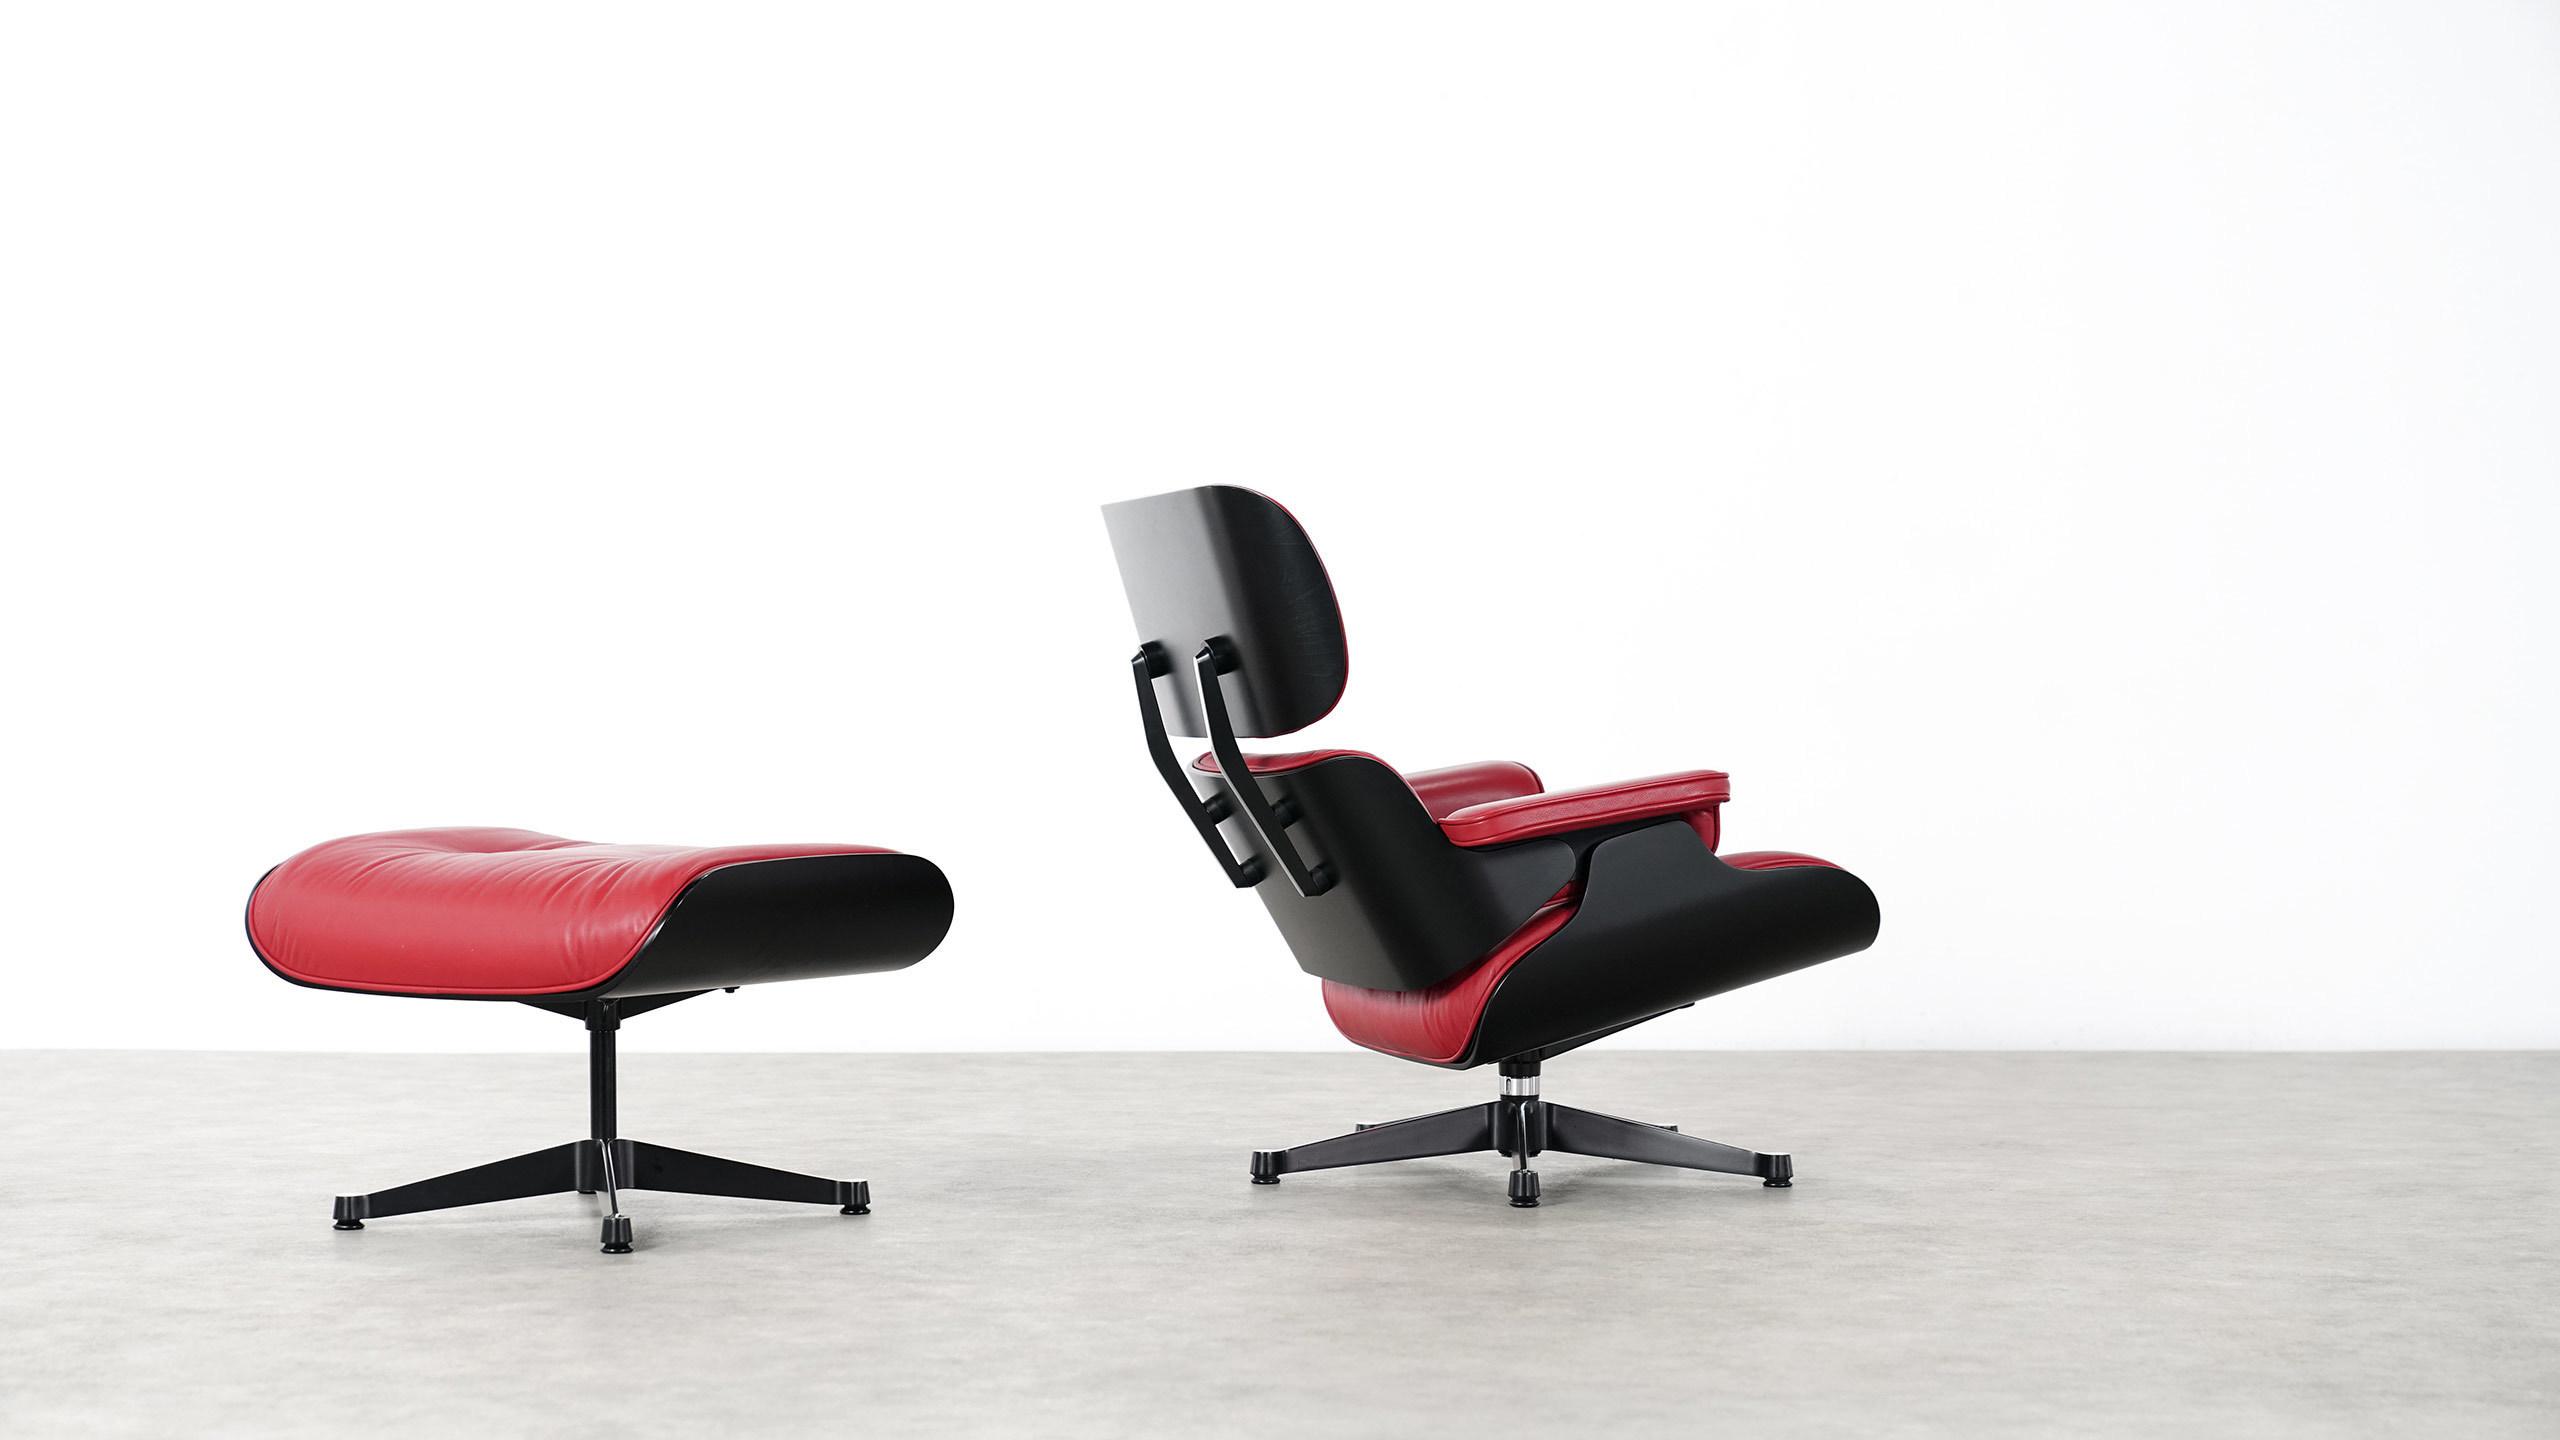 Ankauf Eames Lounge Chair Vitra